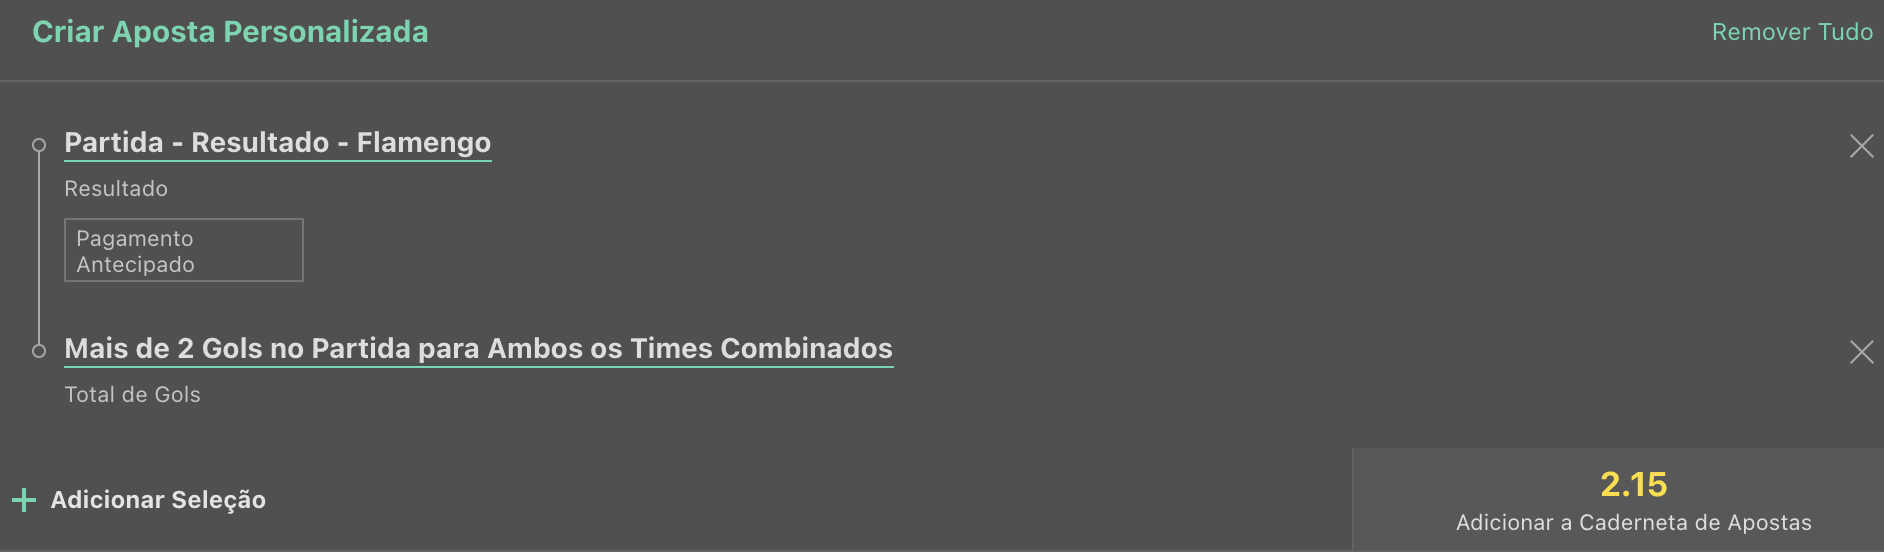 Bilhete pronto, palpite hoje, flamengo juventude aposta dupla personalidade bet365.